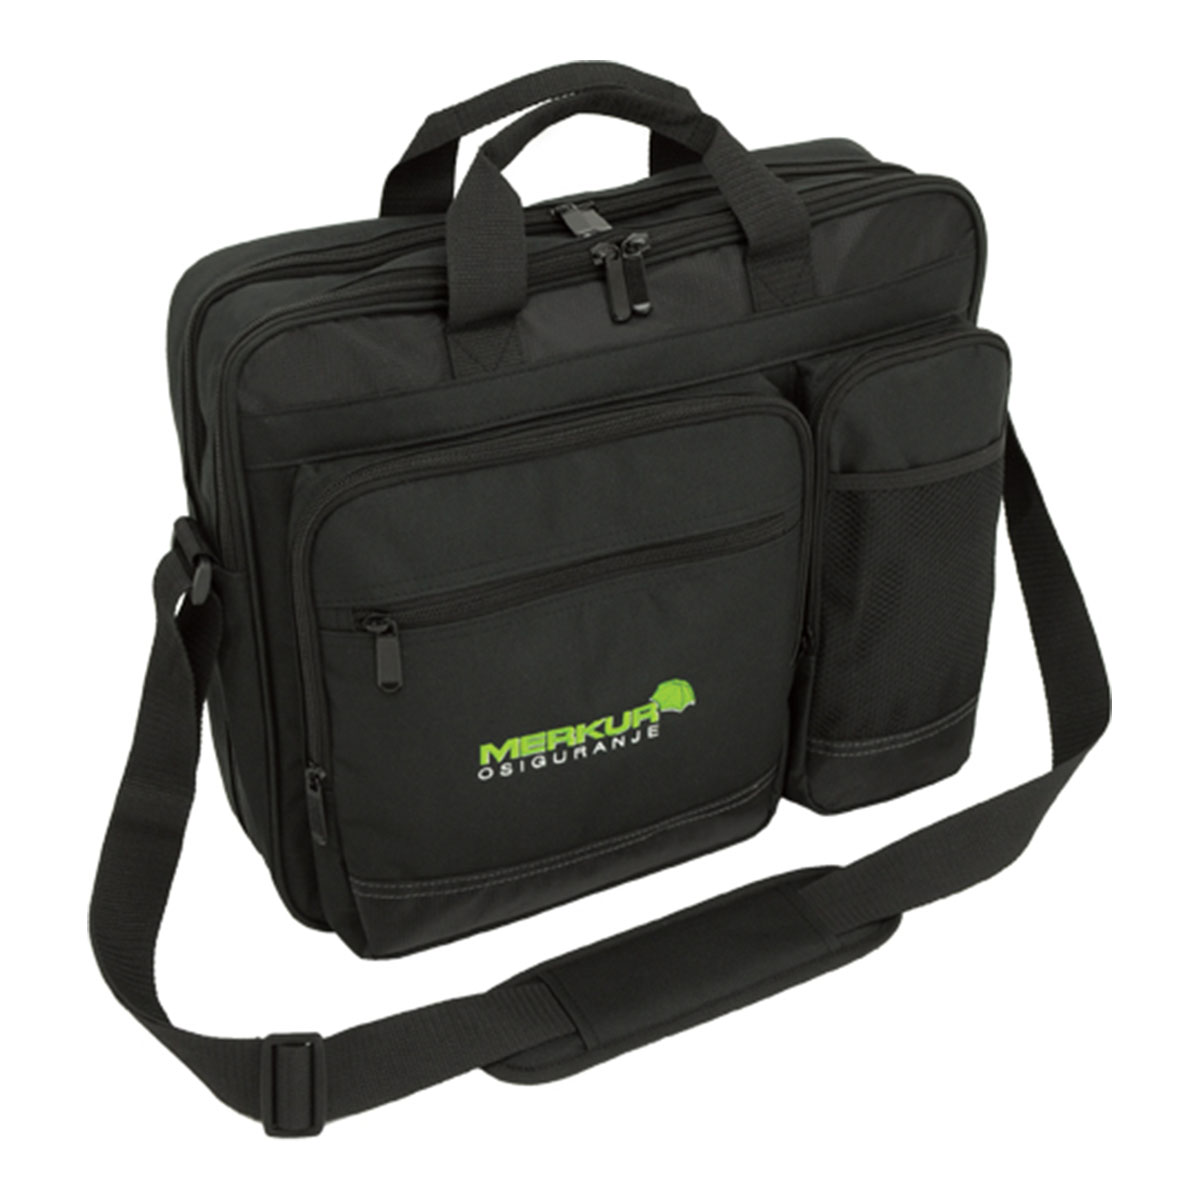 Nemesis Conference Bag